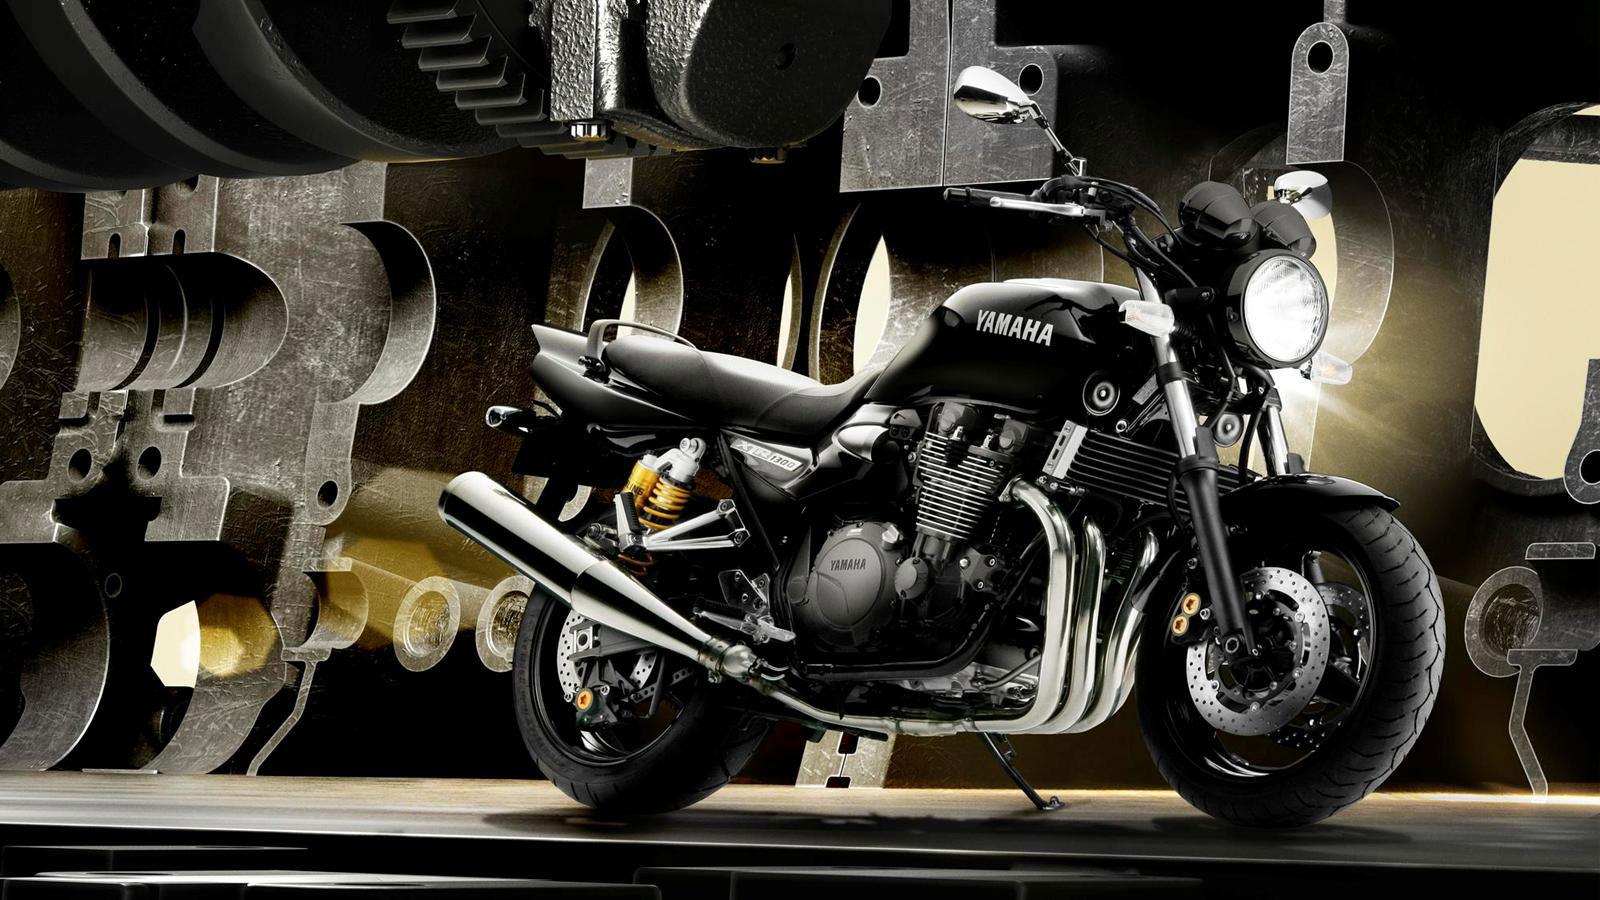 2013-Yamaha-XJR1300a